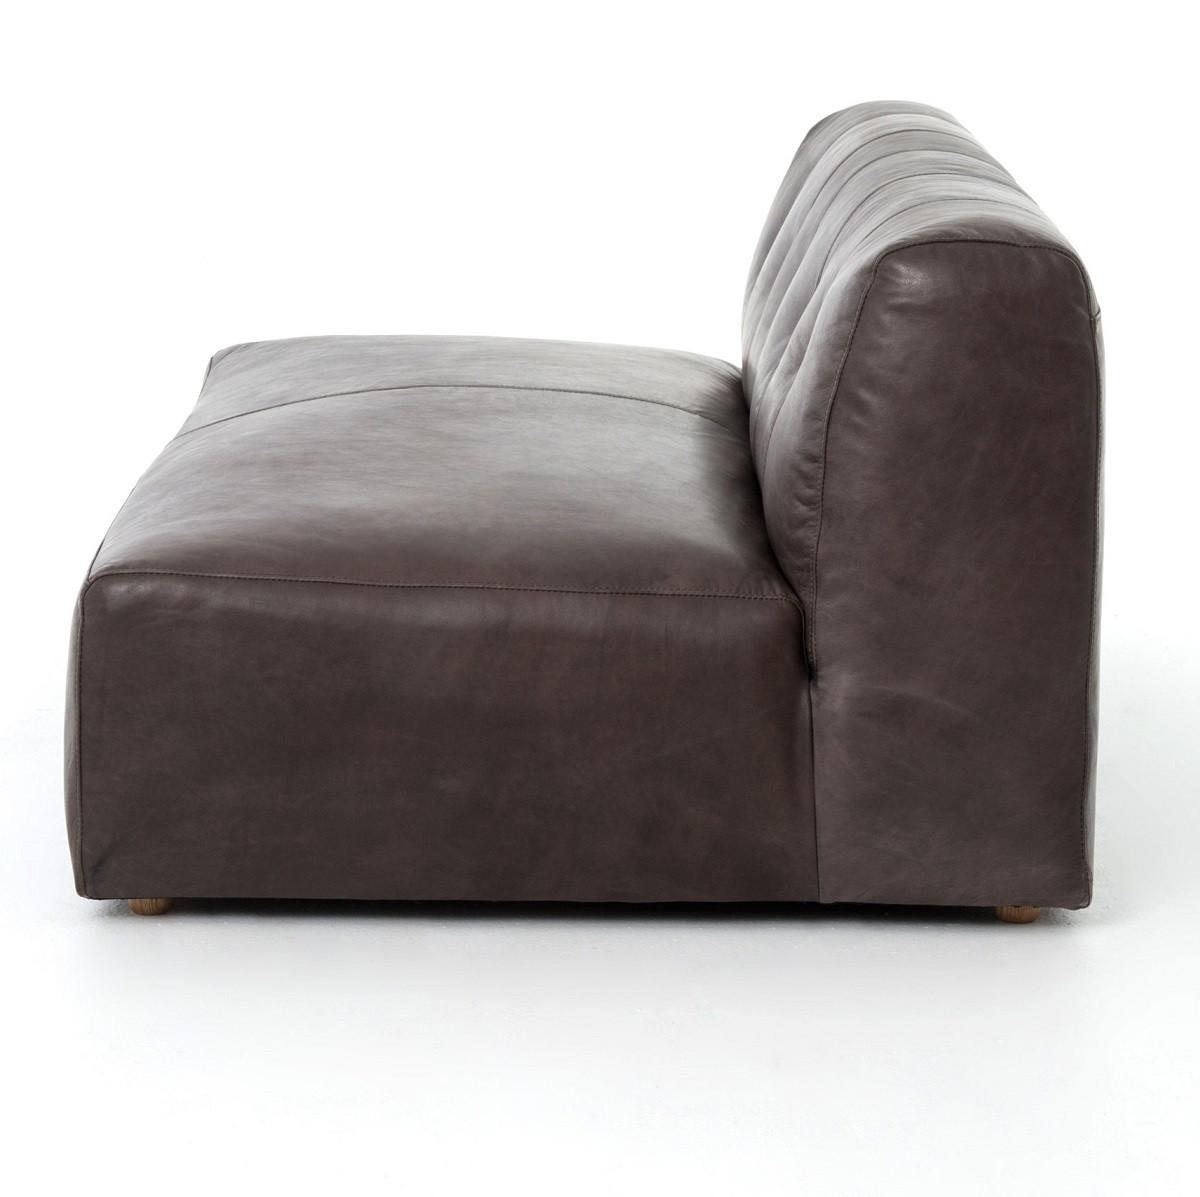 Rio Gunmetal Leather 2 Piece Sectional Sofa Zin Home